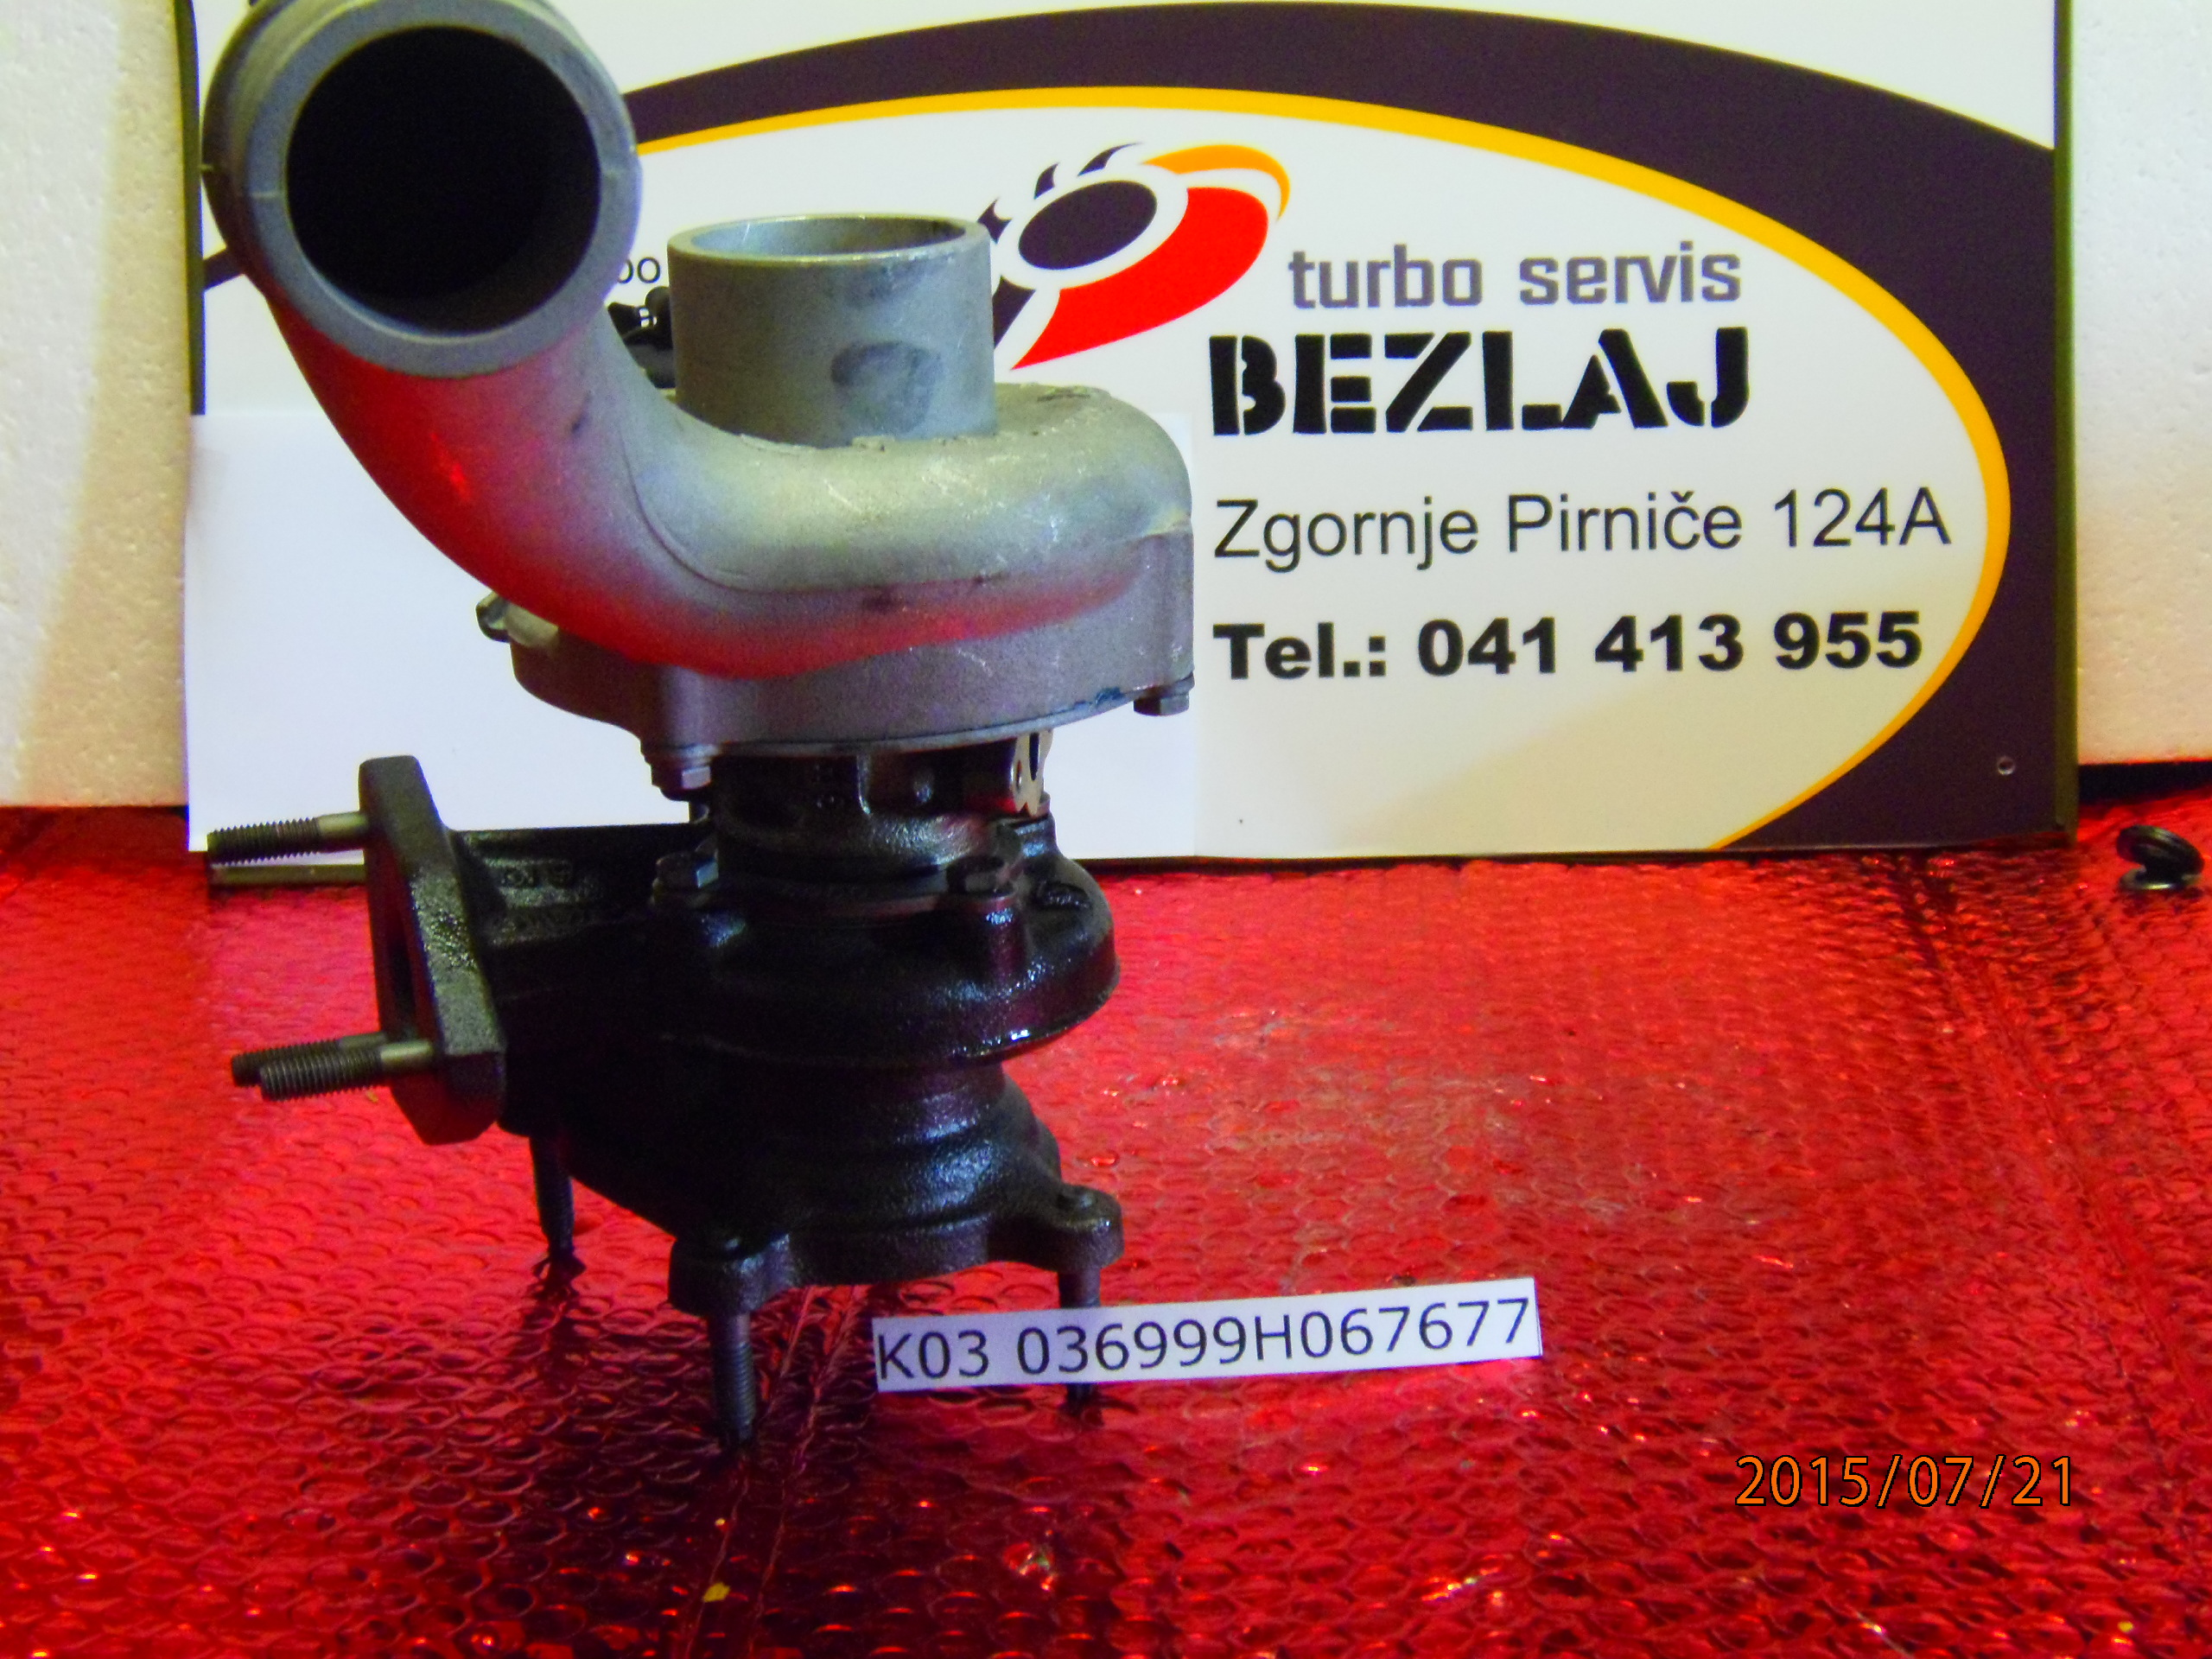 turbo K03 036999H067677